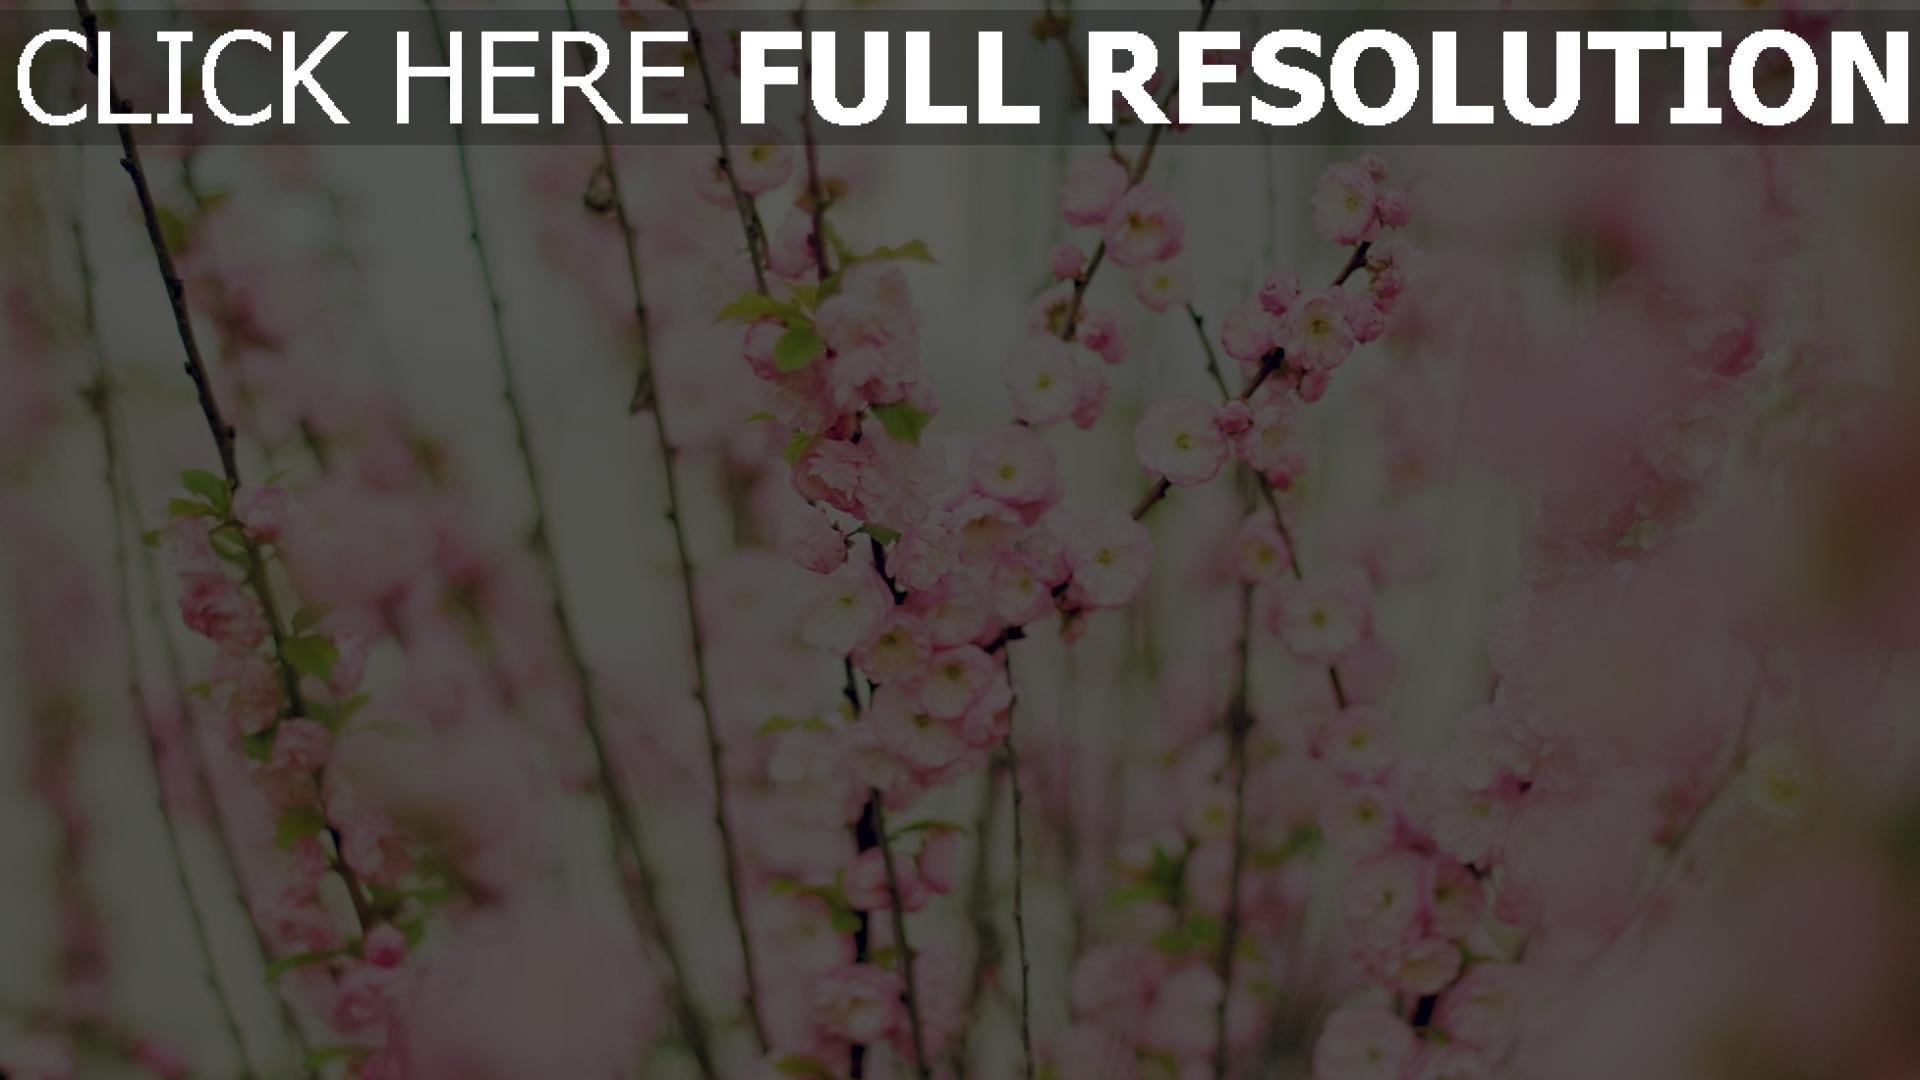 herunterladen 1920x1080 full hd hintergrundbilder magnolie bl tenbl tter rosa bl te zweige. Black Bedroom Furniture Sets. Home Design Ideas